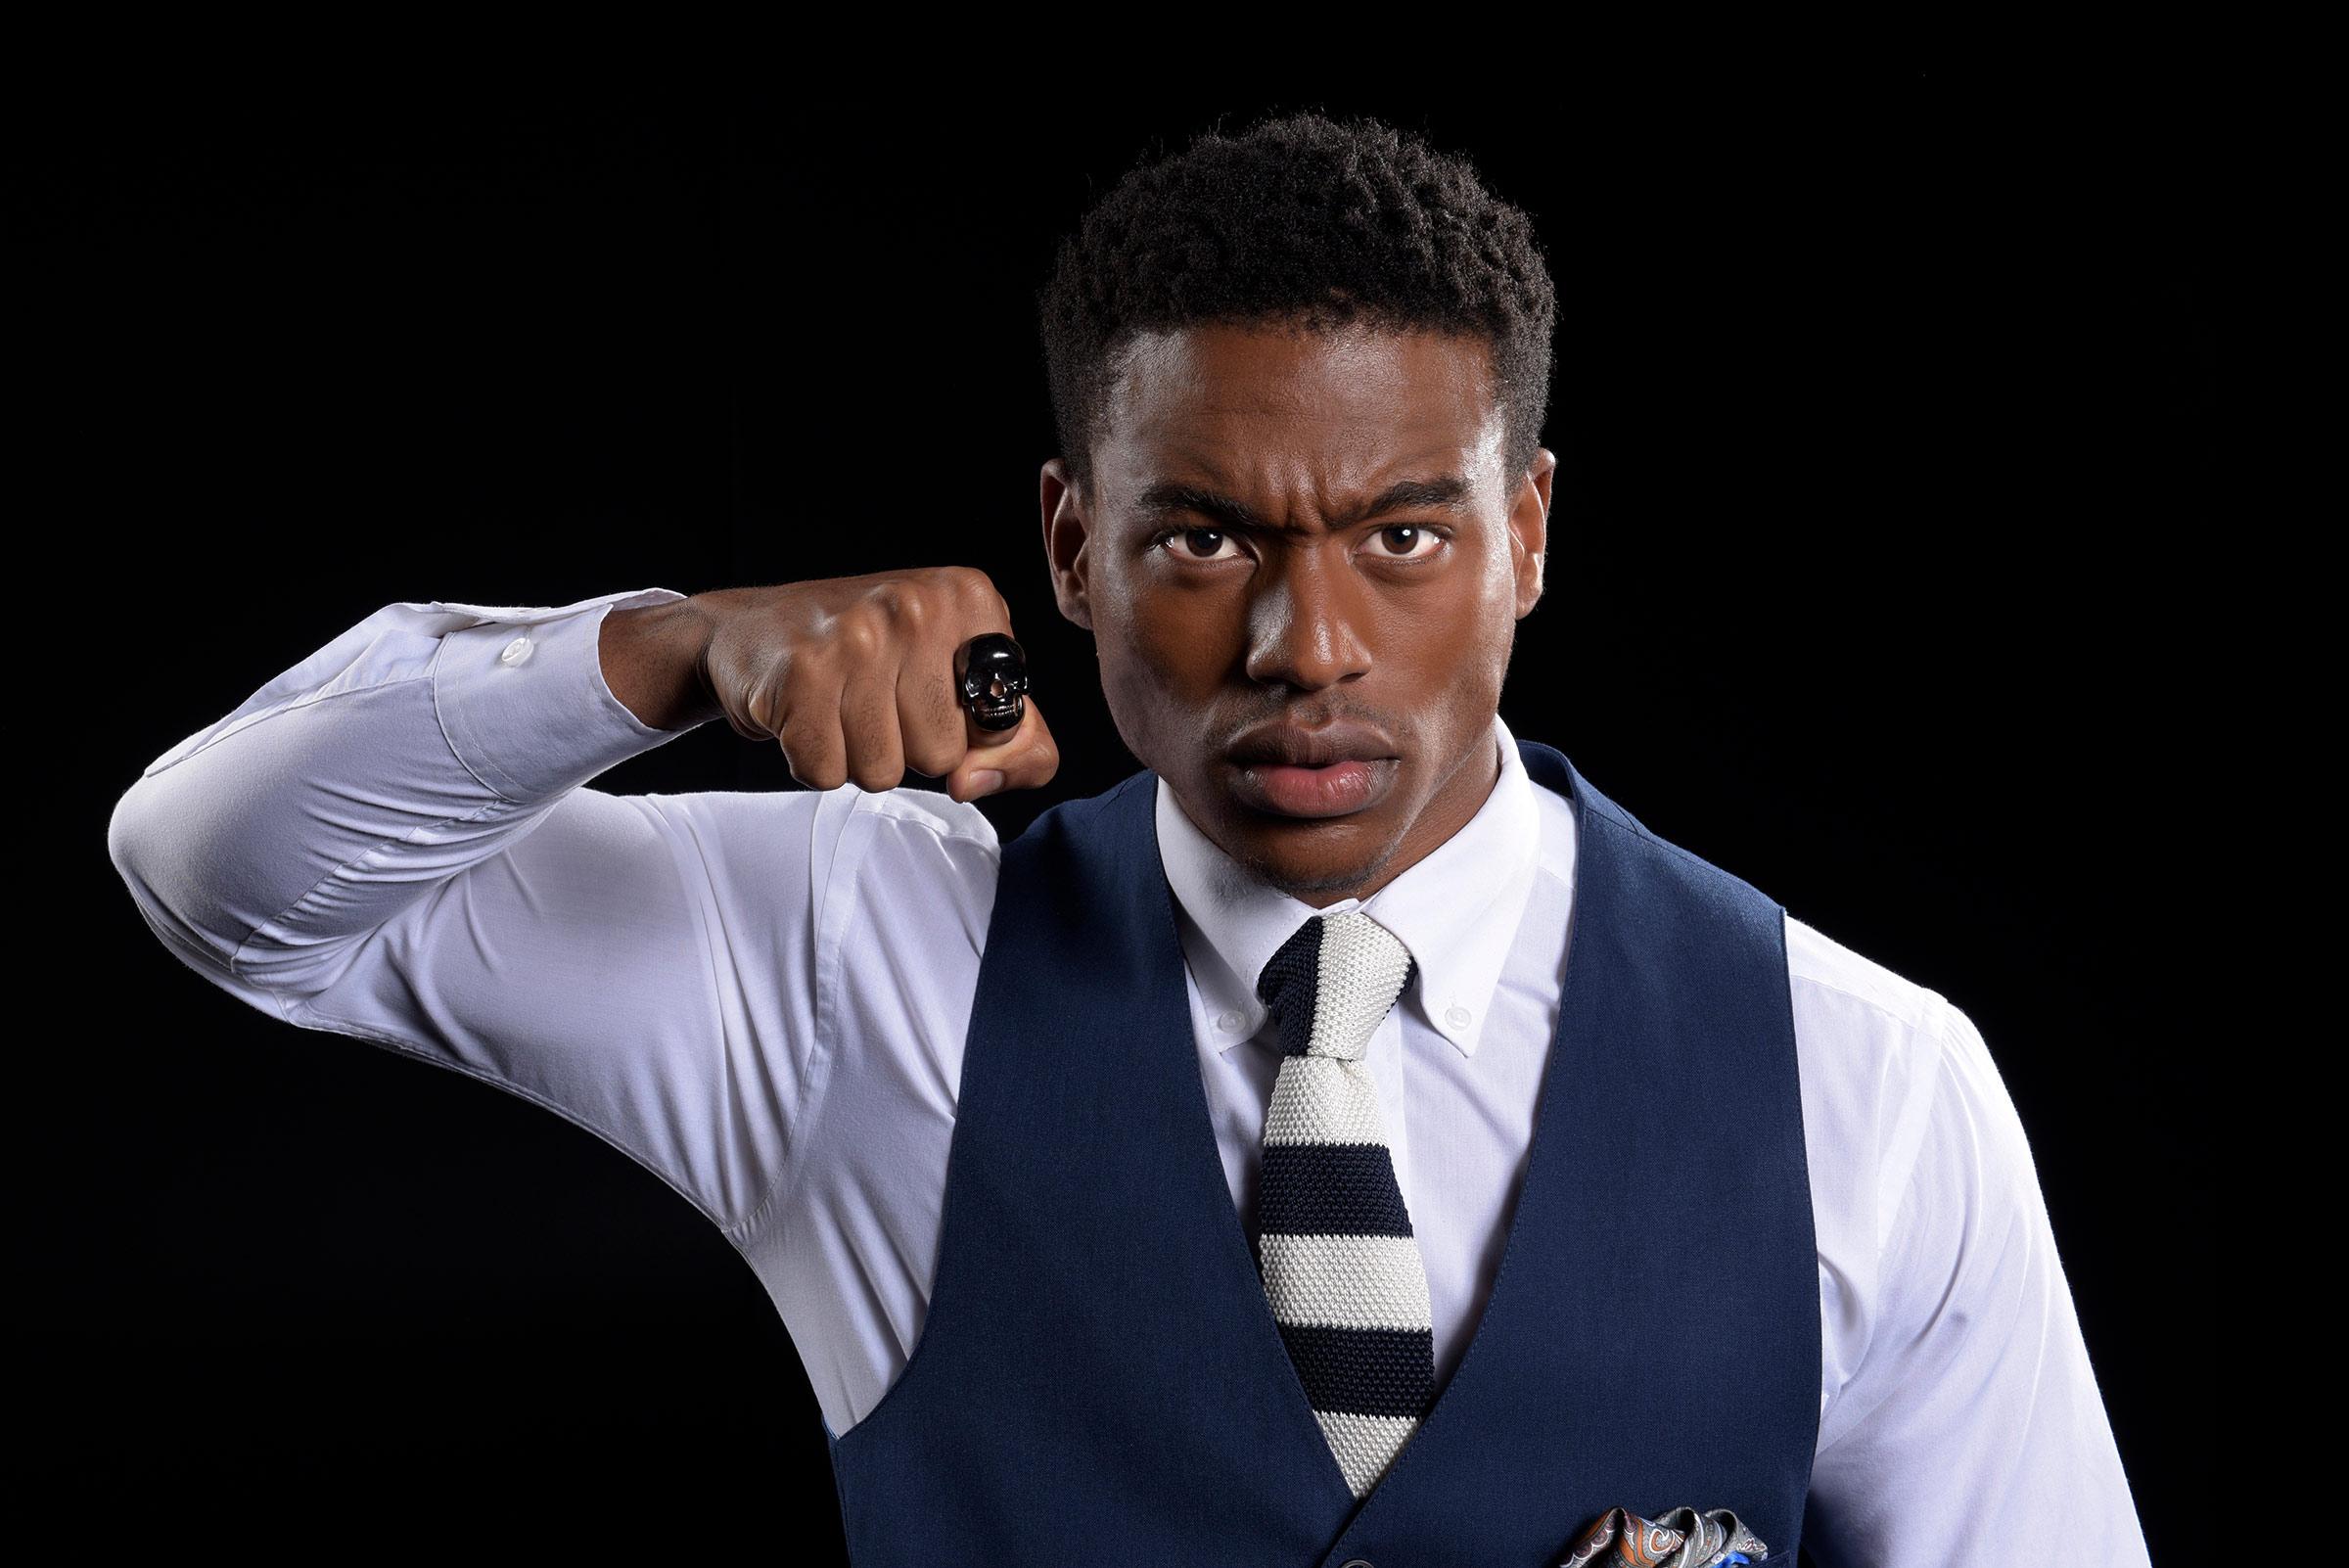 corporate-portrait-photography-studio-shoot-top-actor-young-african-man-brandon-barnard-photographer.jpg